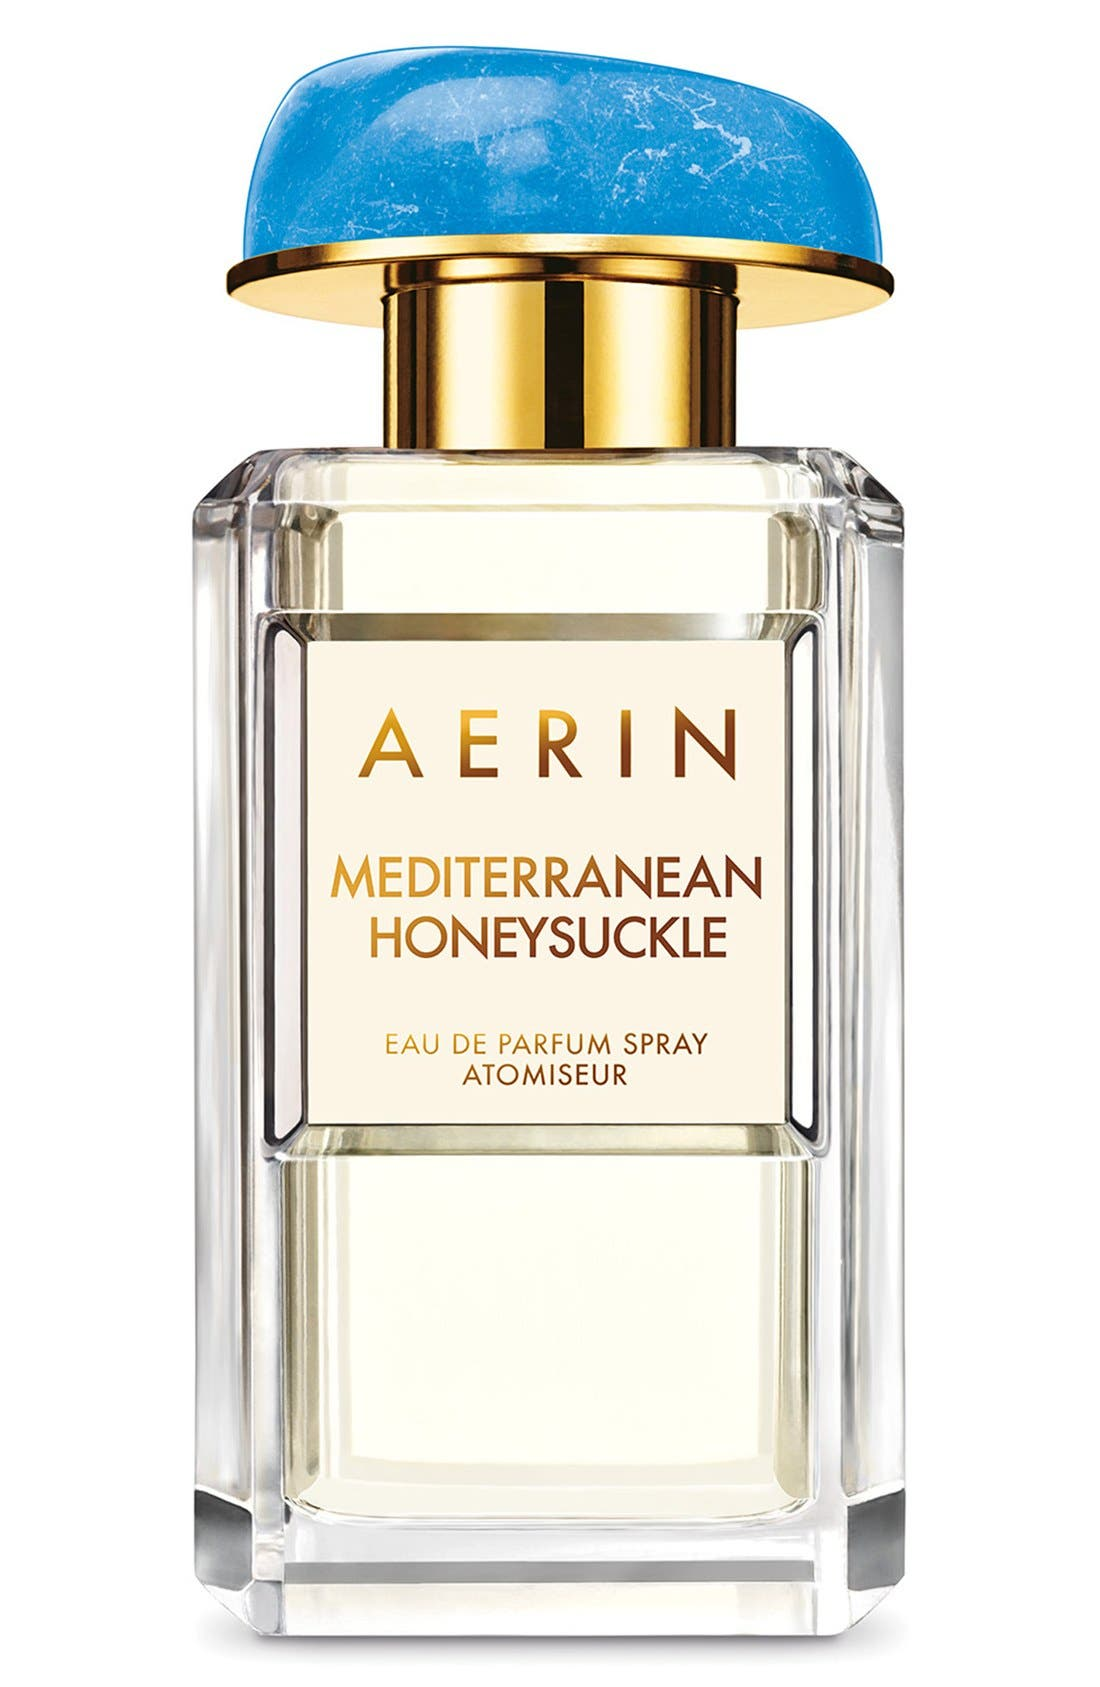 AERIN Beauty Mediterranean Honeysuckle Eau de Parfum